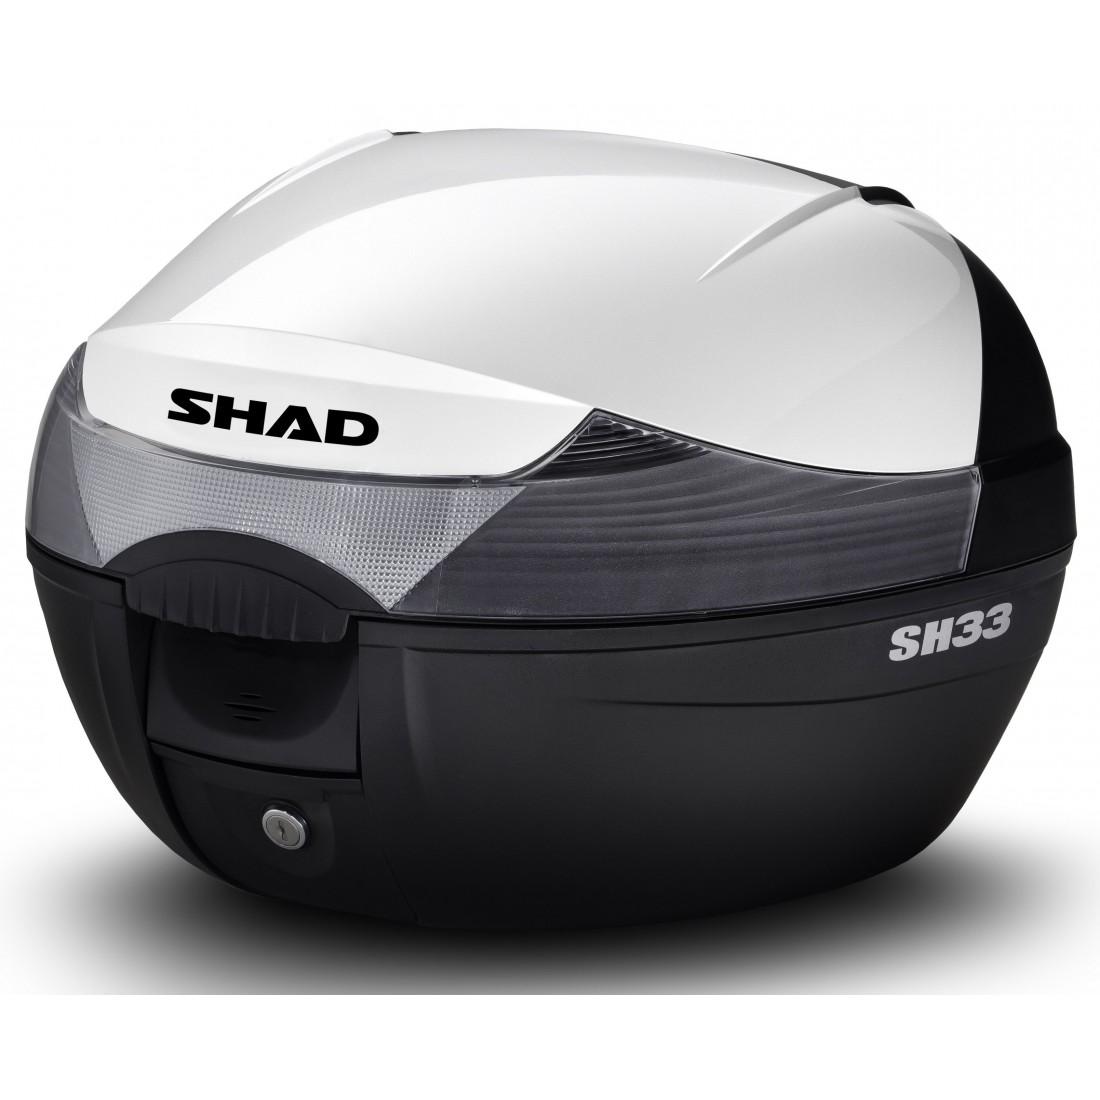 Tapa Baúl Shad SH33 33lt Blanco